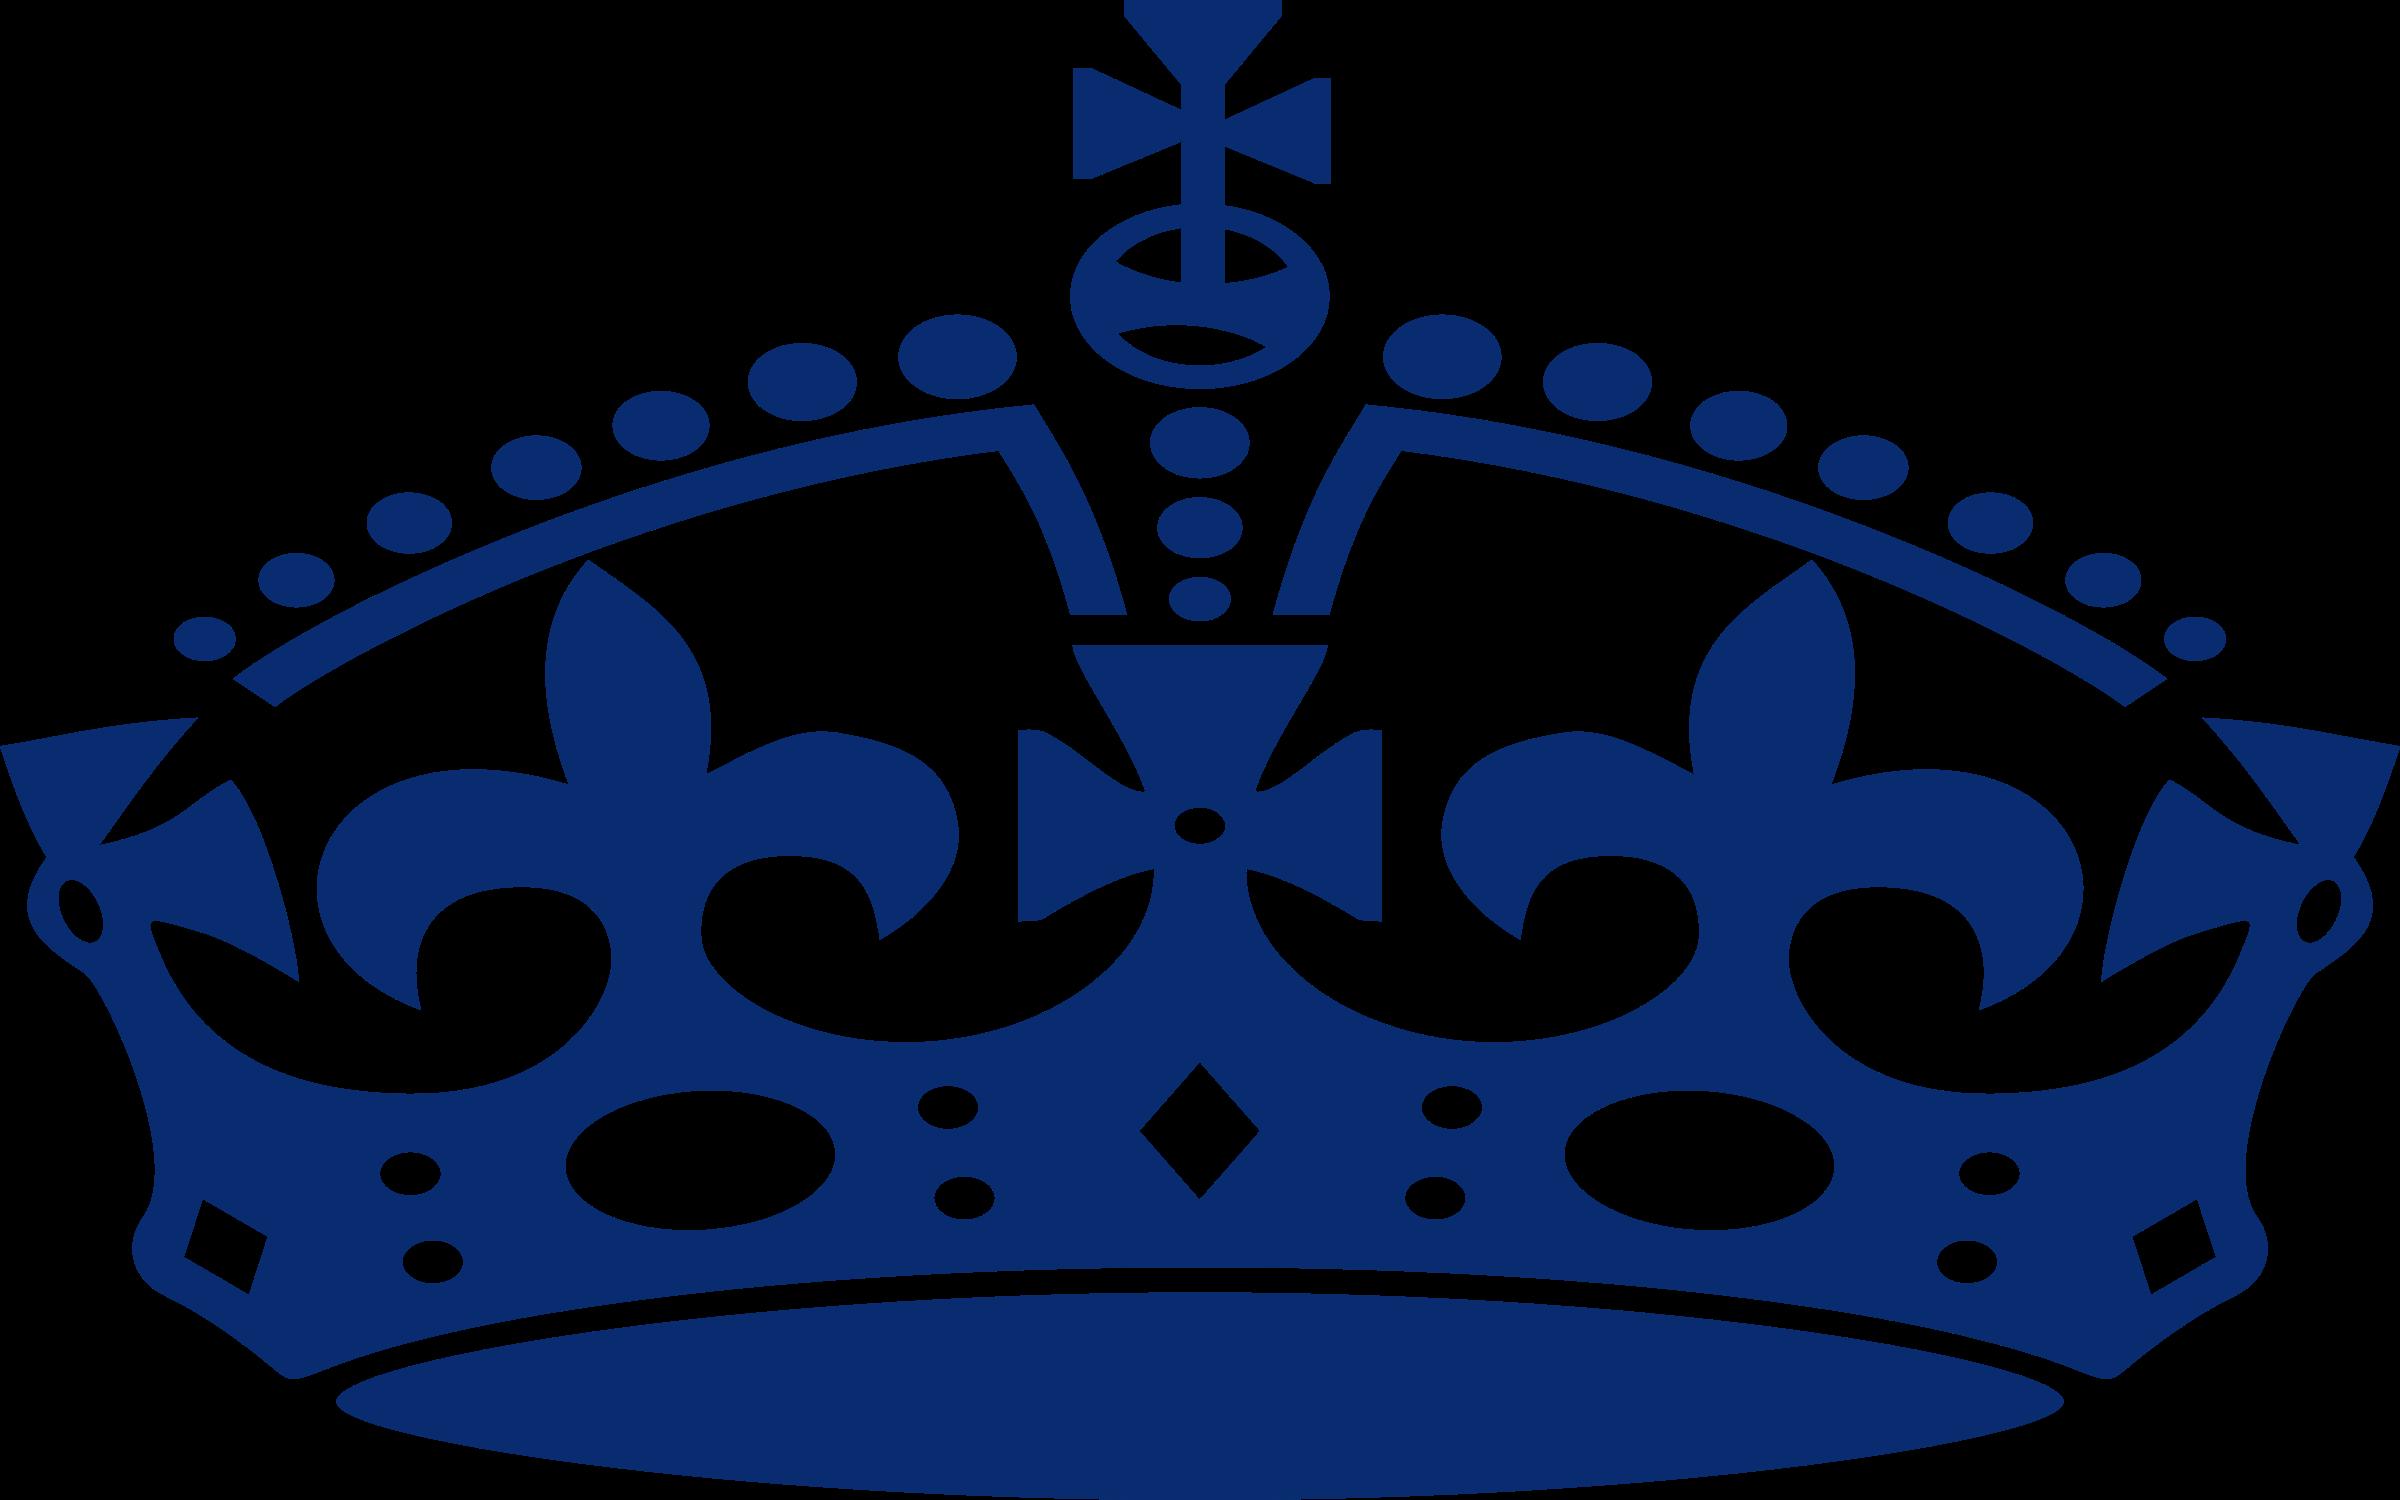 Dark Blue clipart crown Clipart Crown Images (788) Crown